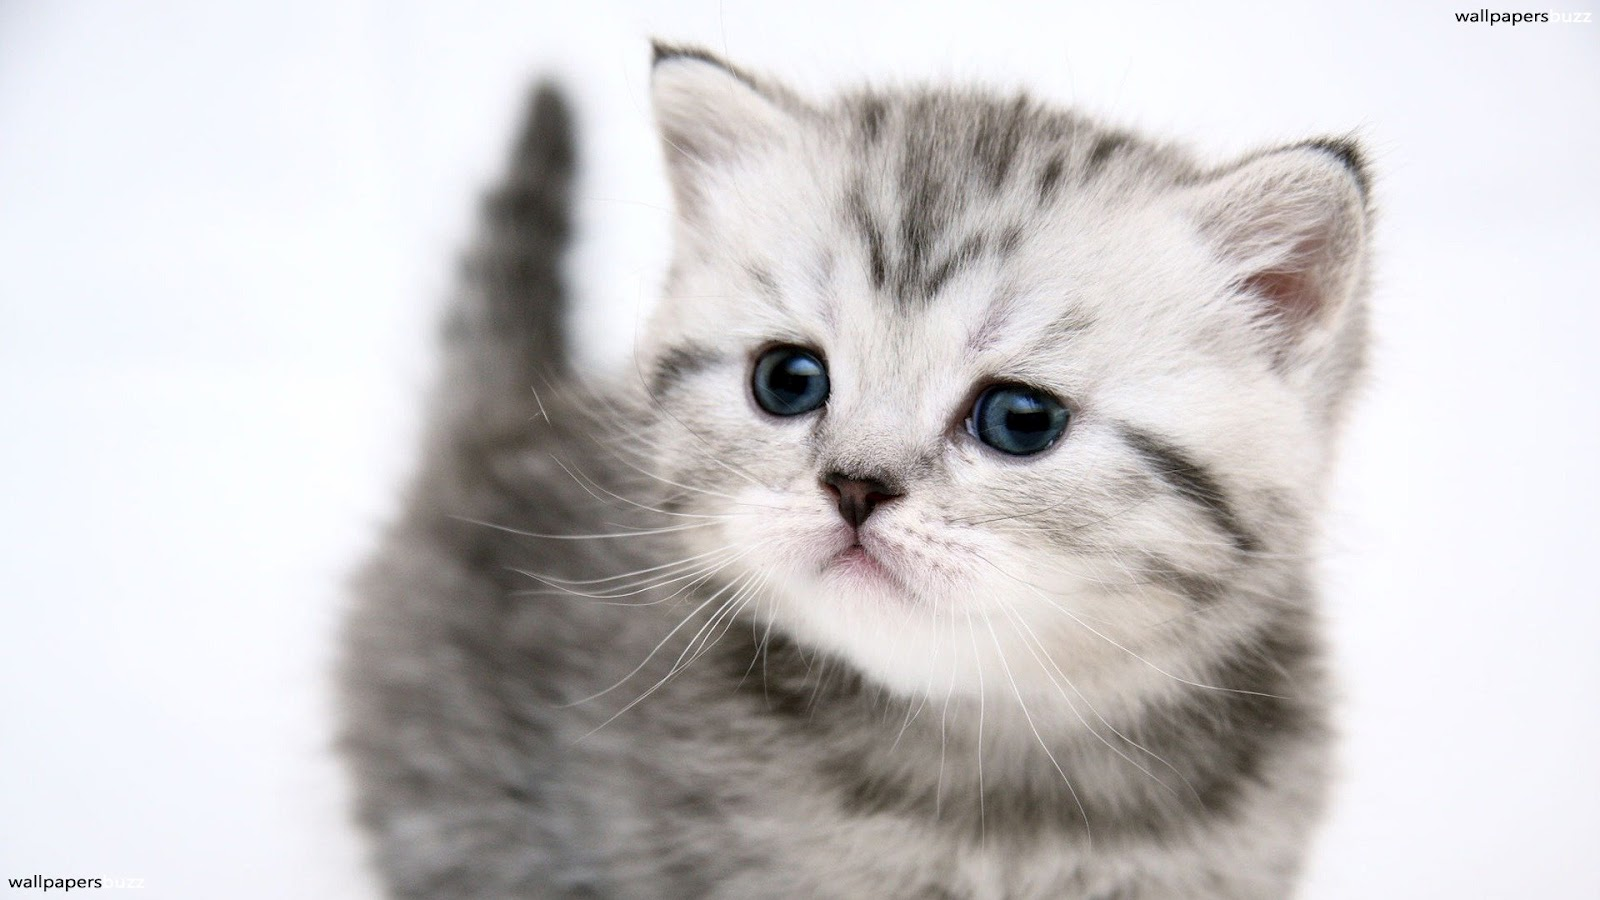 http://1.bp.blogspot.com/-Ama_t1gn2MA/T8gxpIRUJXI/AAAAAAAAA2Y/vOM6krExFug/s1600/cat-wallpaper-2.jpg